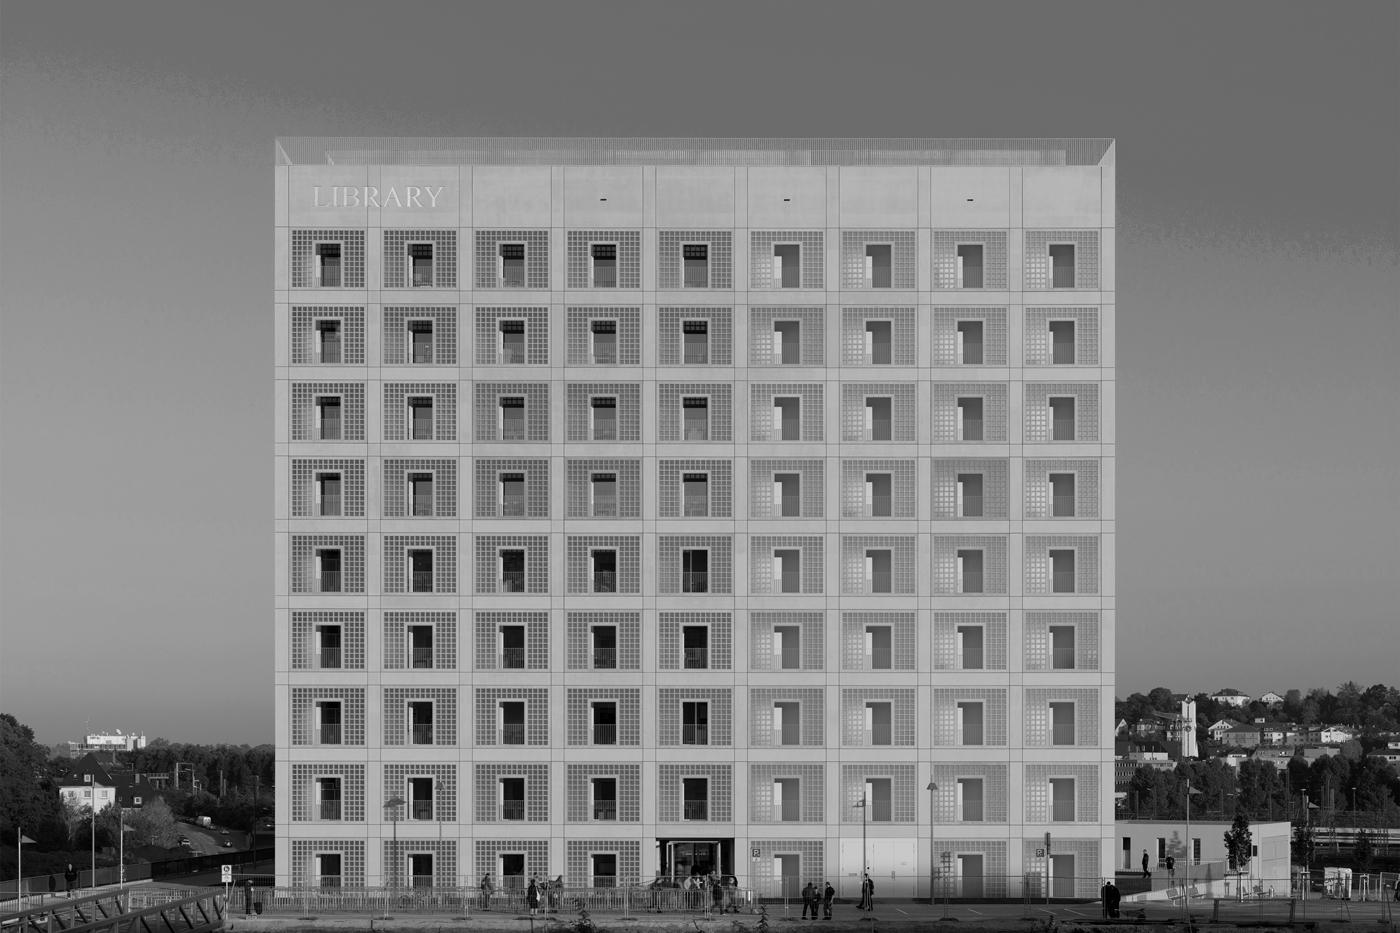 Stadtbibliothek Stuttgart, Foto: © Stefan Müller